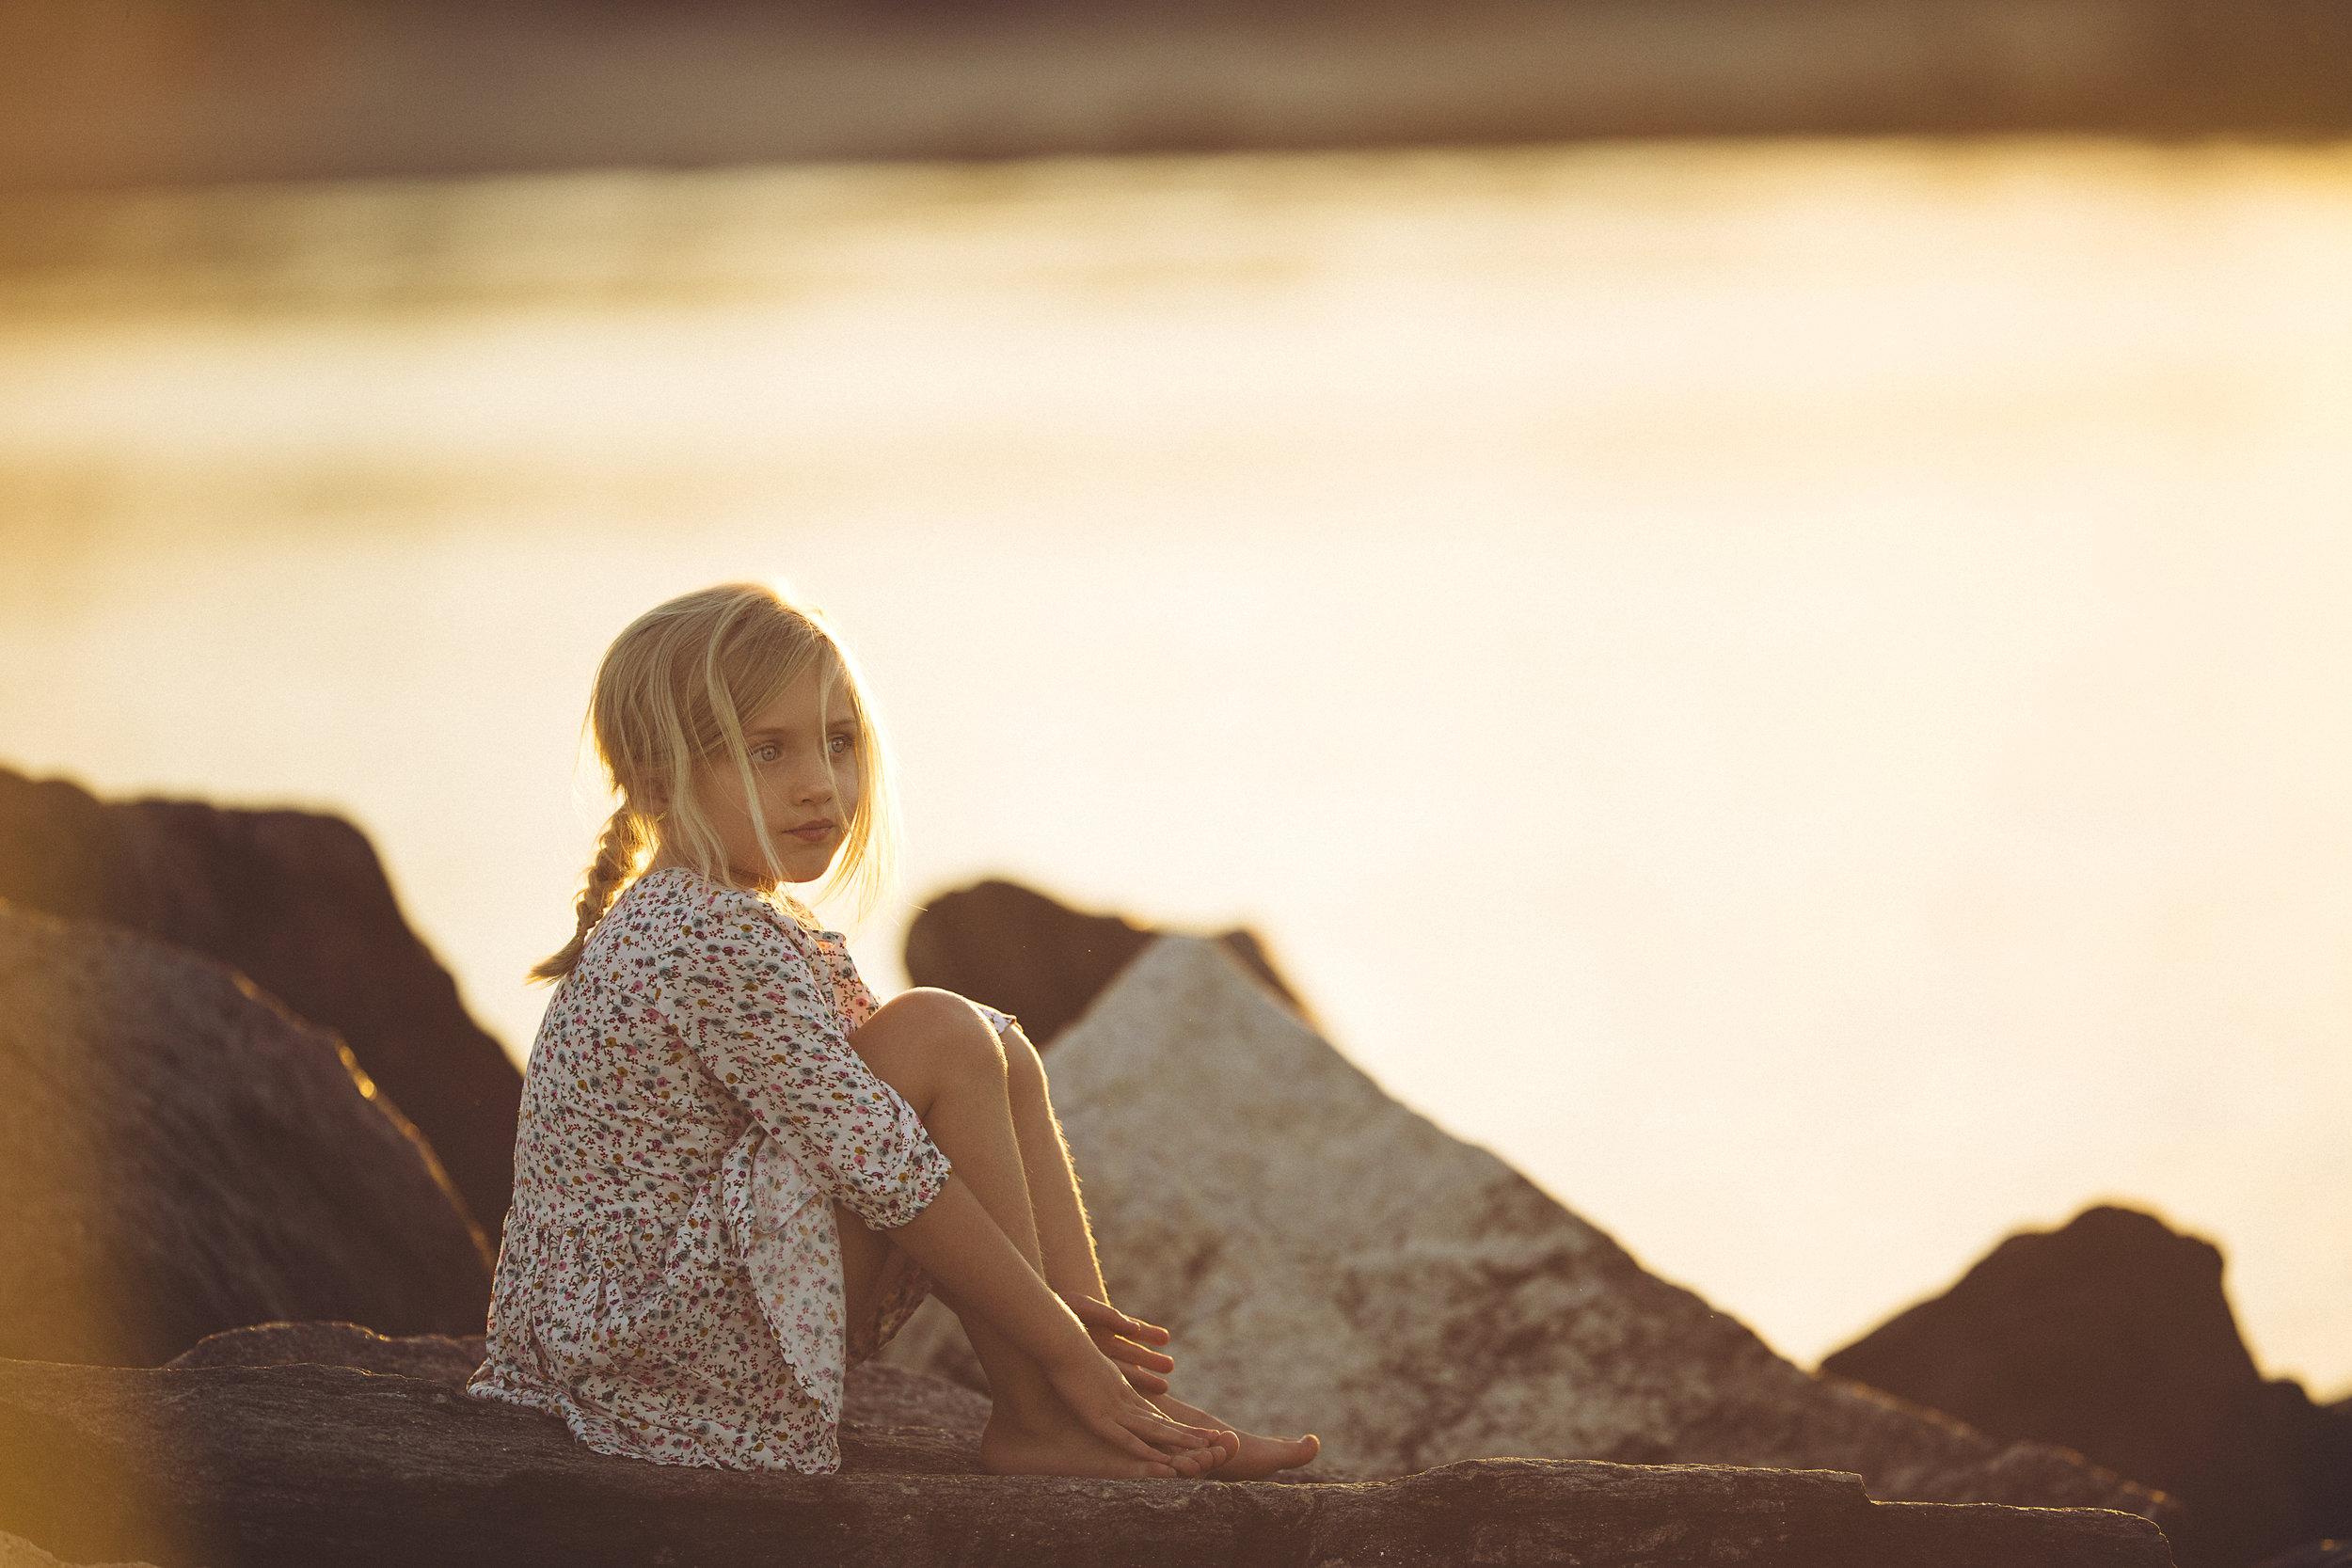 Hello-olivia-photography-Long-island-photography-children-session-family-lifestyle-cedar-beach-sinai.jpg